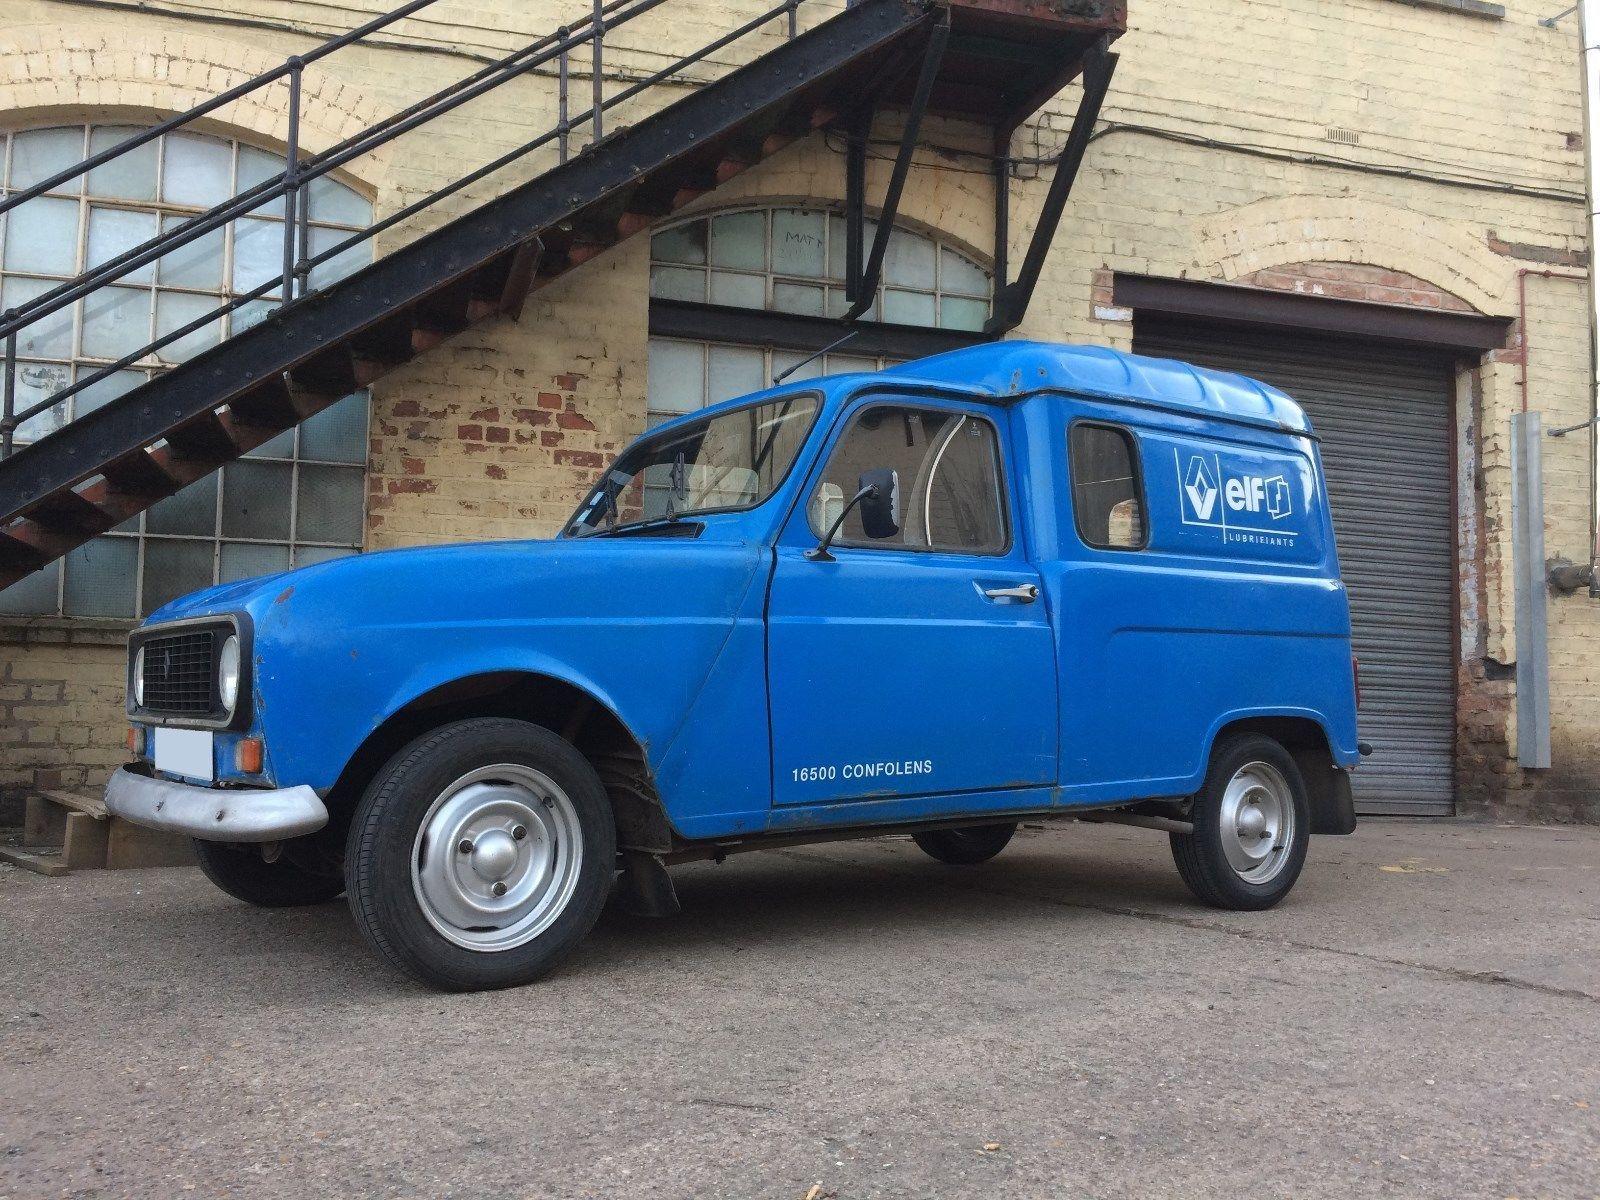 1986 Renault 4 Van - French LHD - UK Registered - MOT 2019 - Nice ...